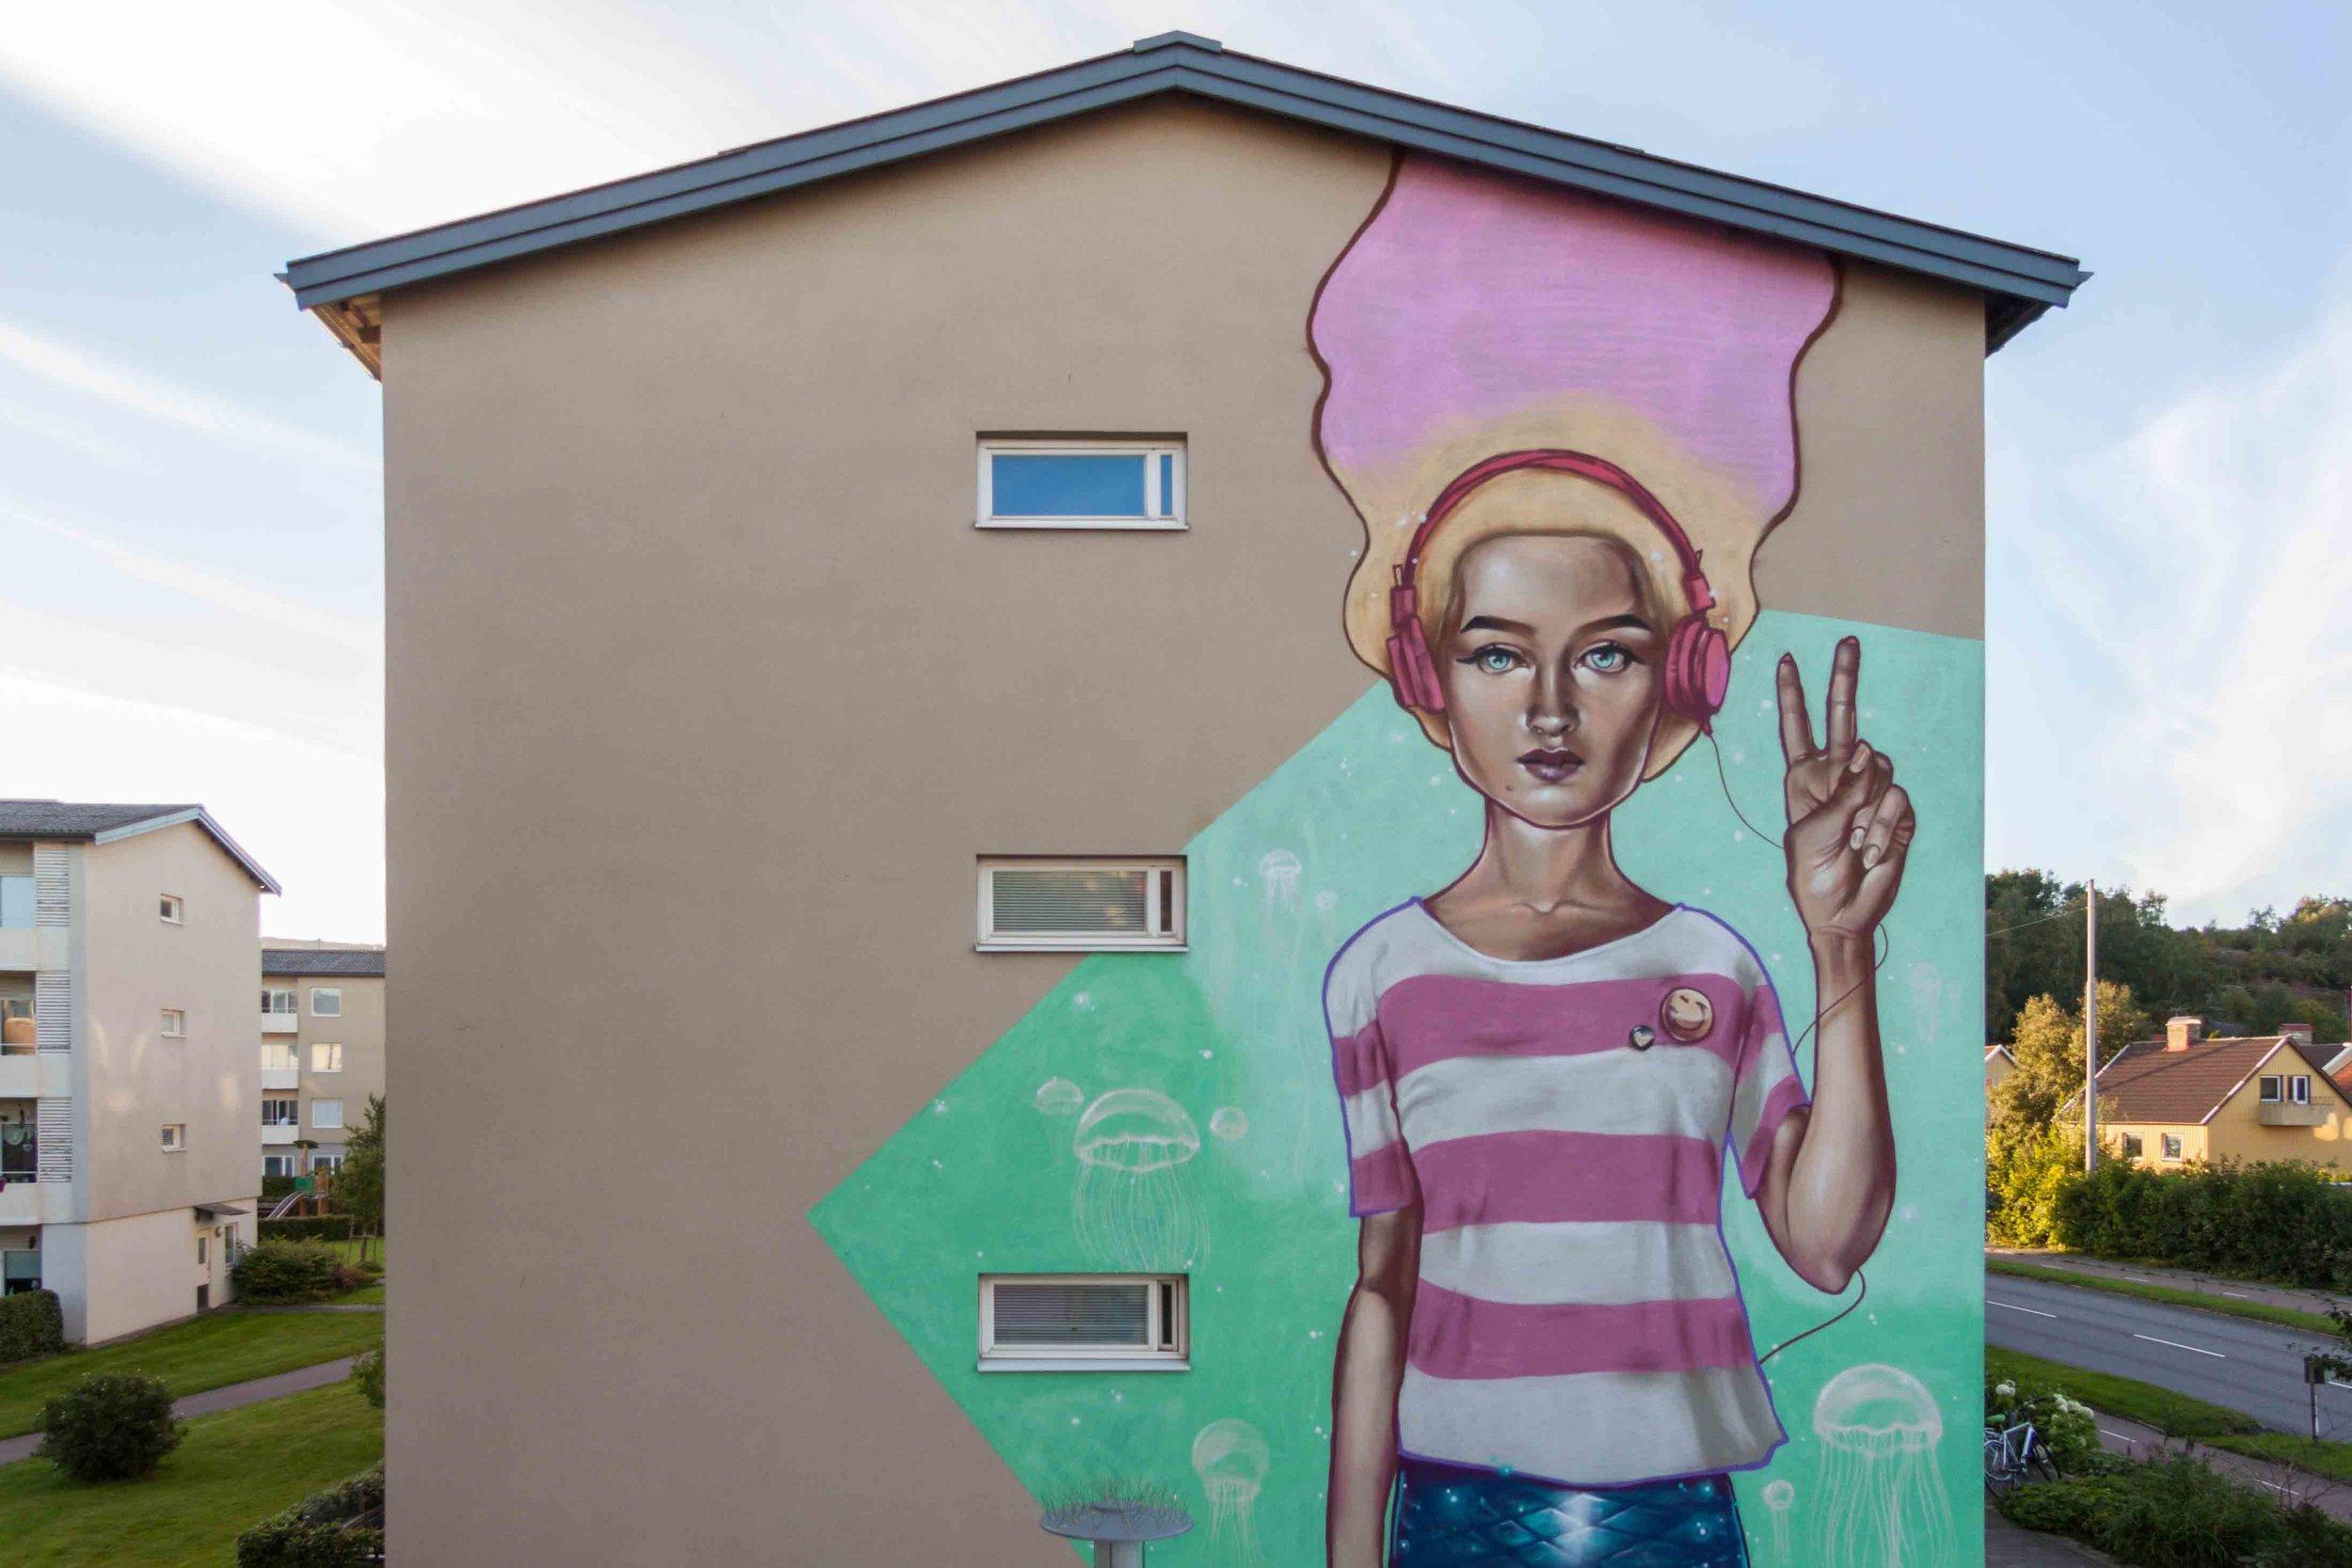 DISK_Artscape_2016-08-16_FredrikÅkerberg_4396x2931_10.jpg